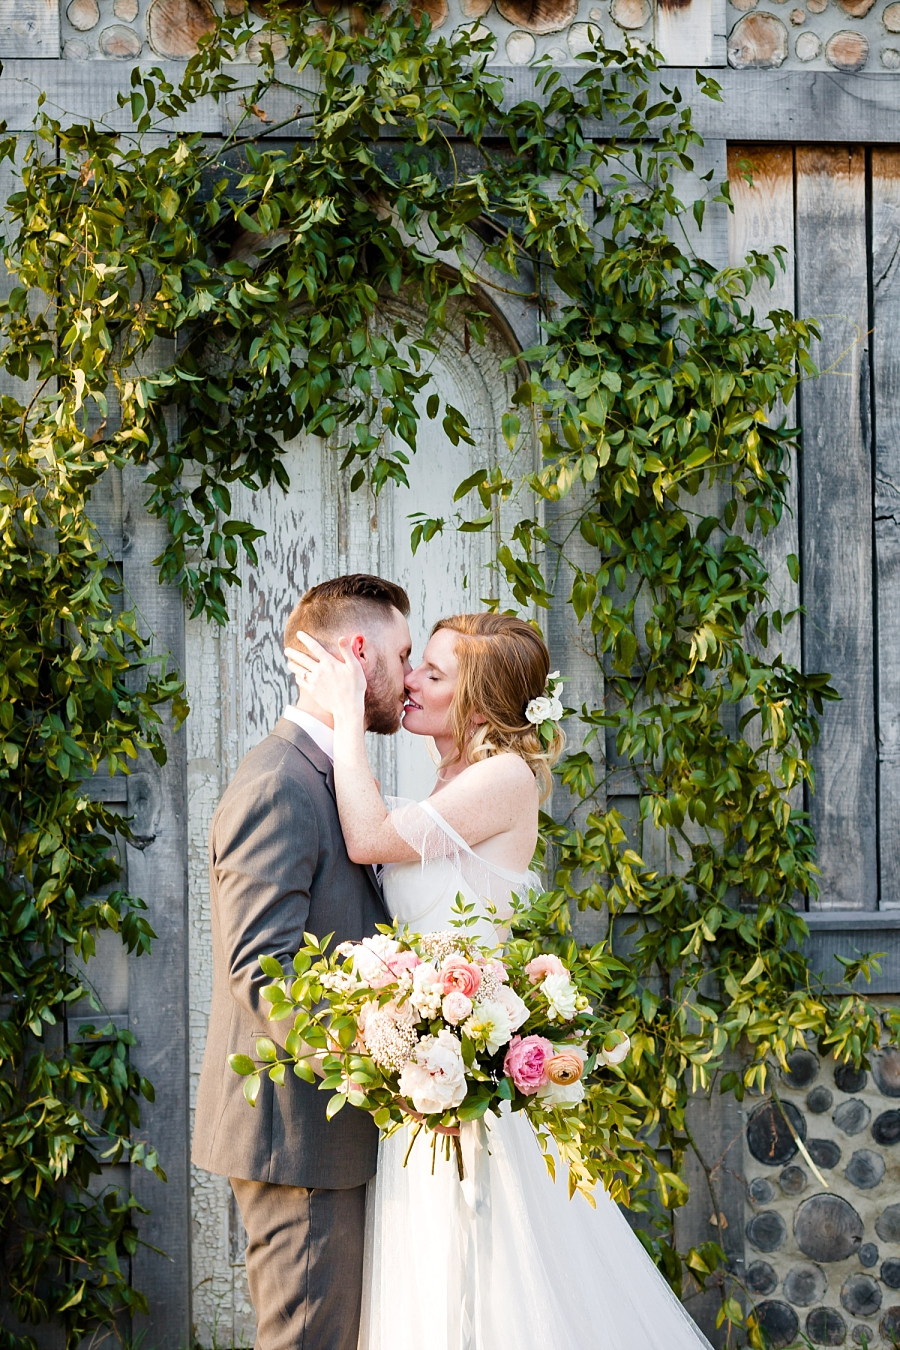 Stacy-Anderson-Photography-Nashville-Houston-Destination-Wedding-Photographer_0029-1.jpg